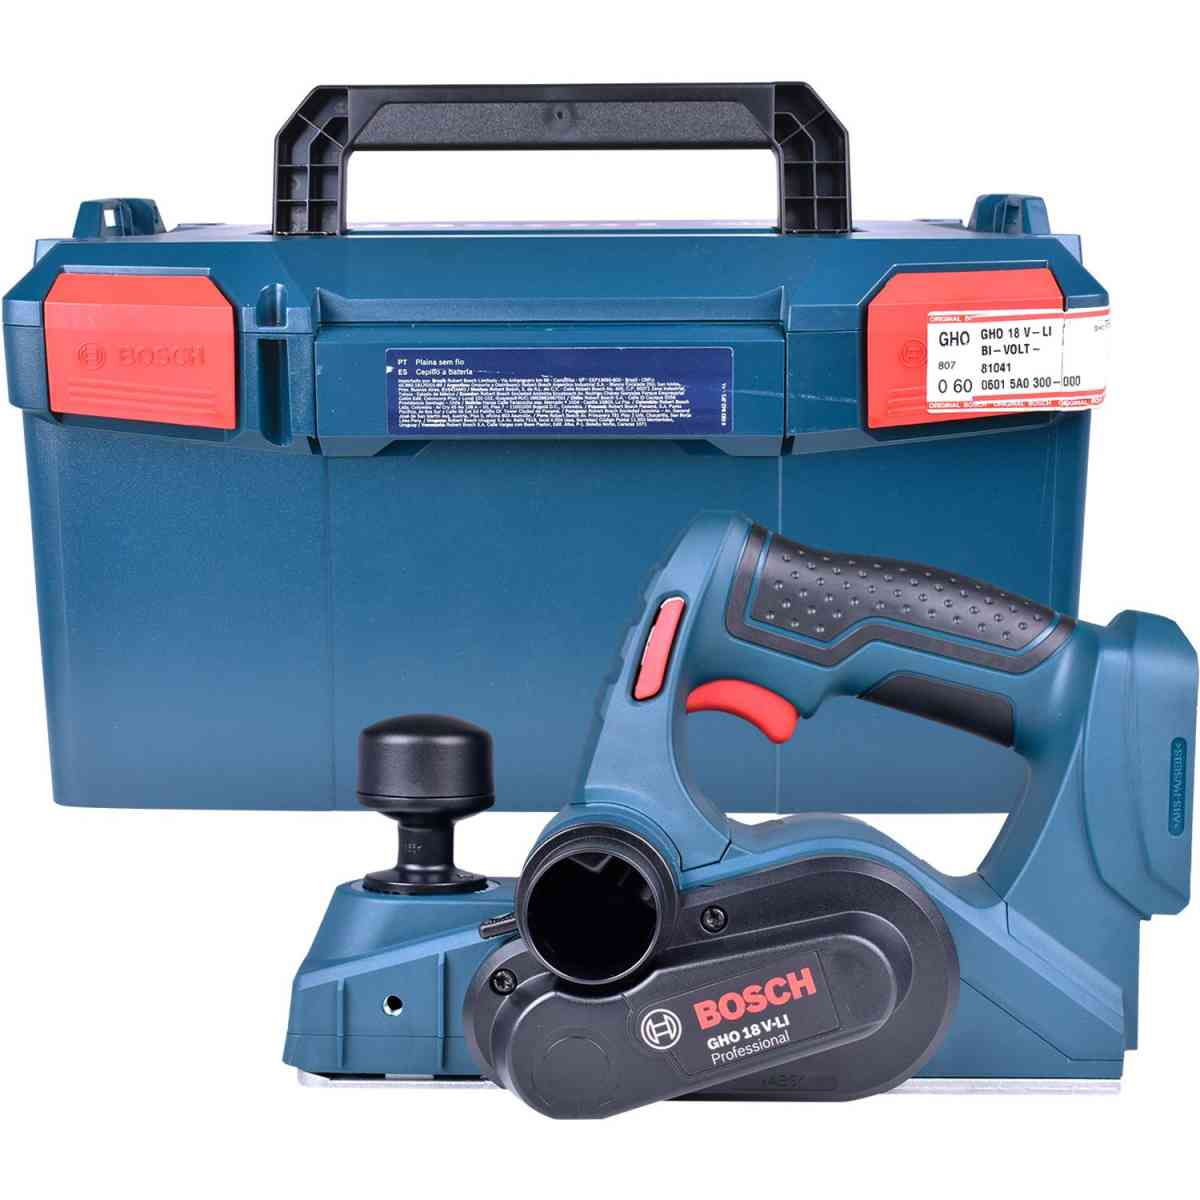 Plaina a Bateria 18V Gho18V-Li Bosch